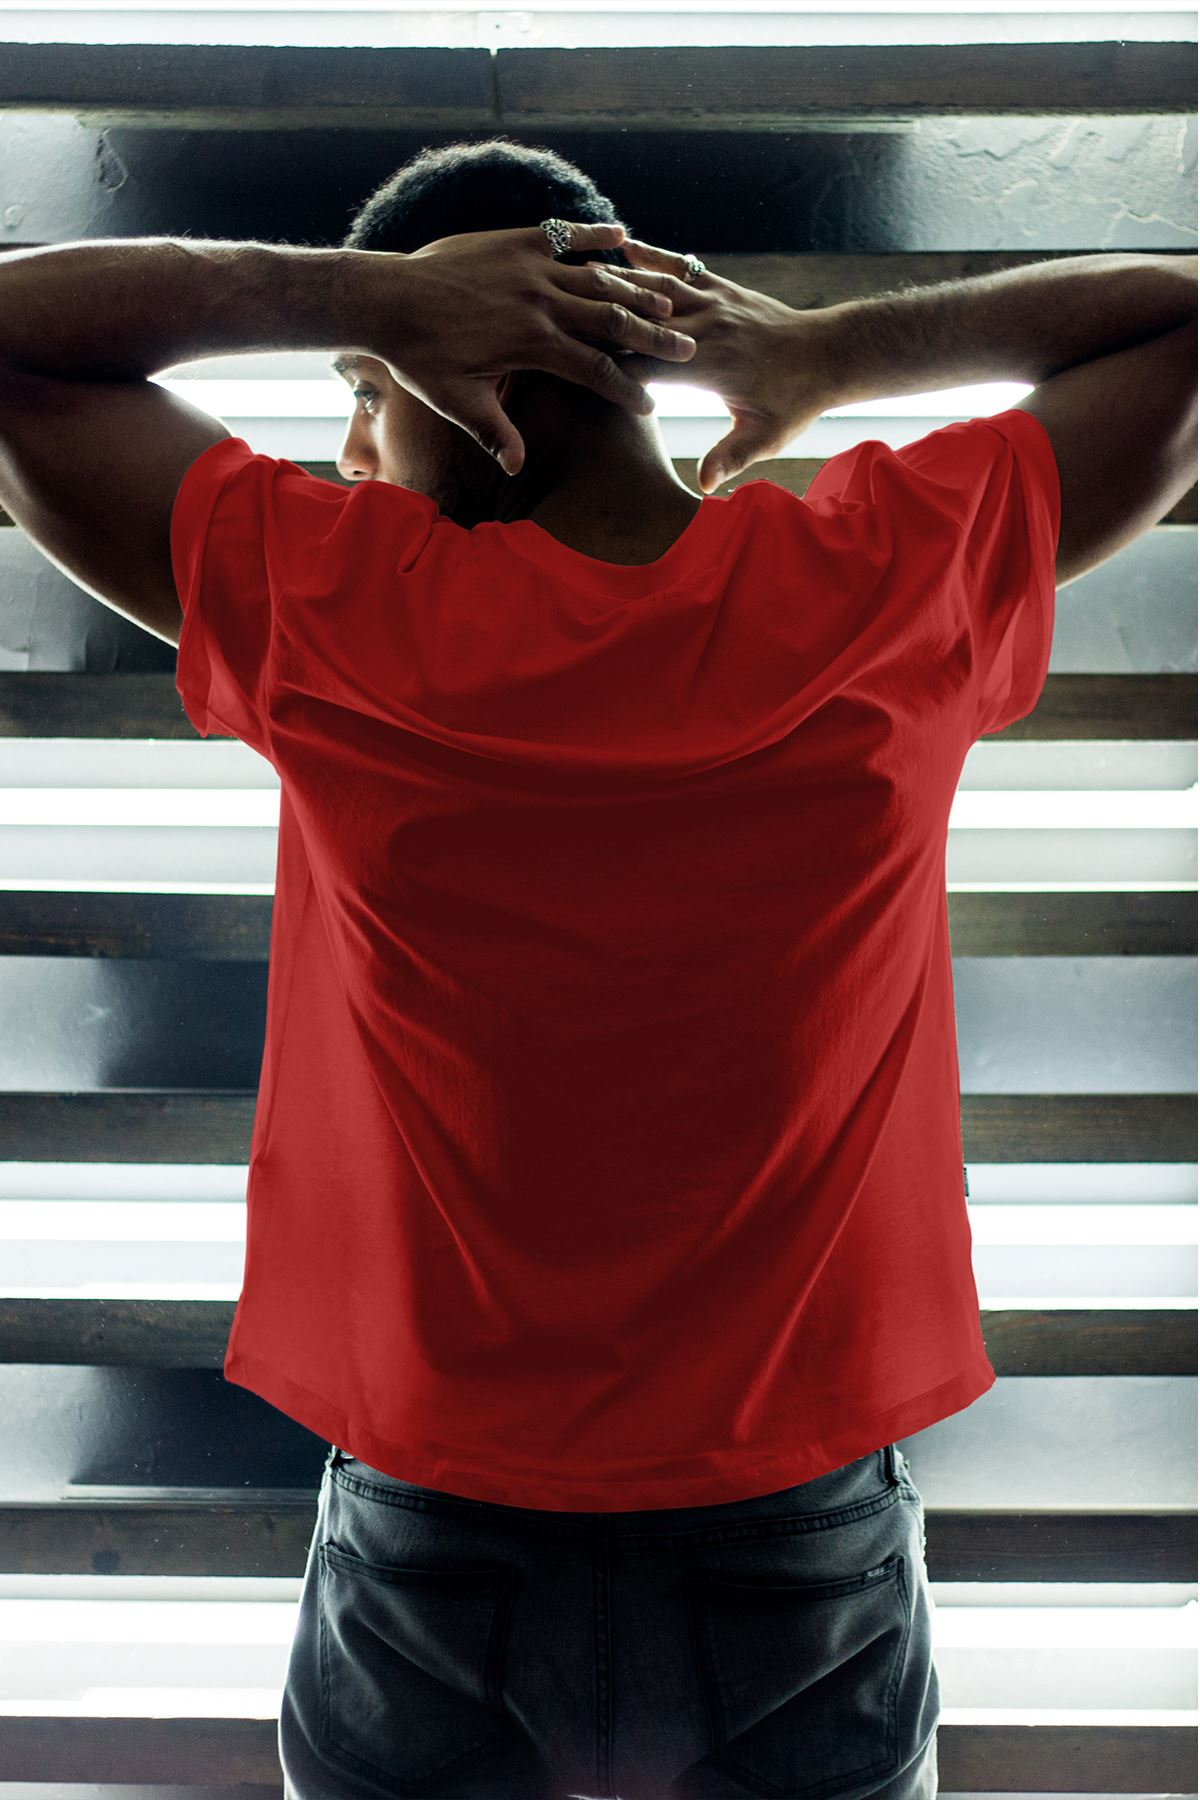 Boston Celtics 26 Kırmızı Erkek Oversize Tshirt - Tişört